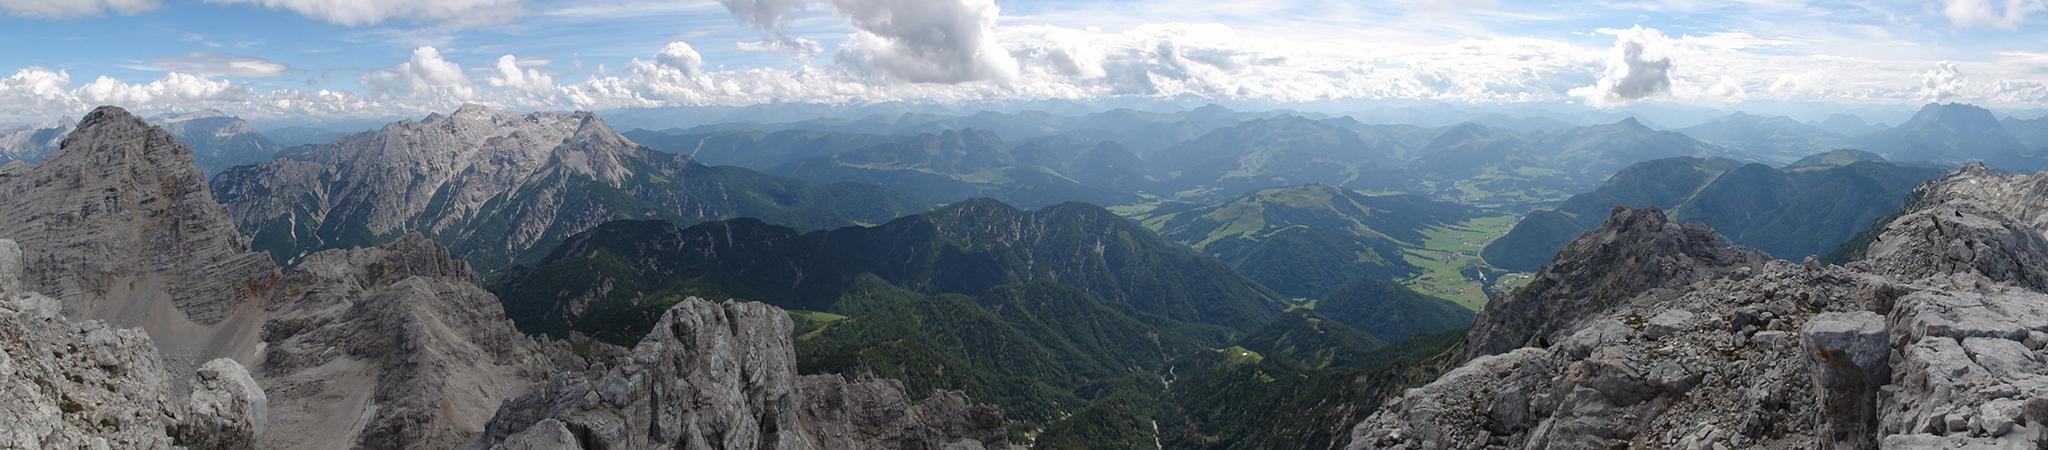 Arnoweg: Ausblick vom Großen Reifhorn (2488 m) Richtung Tirol